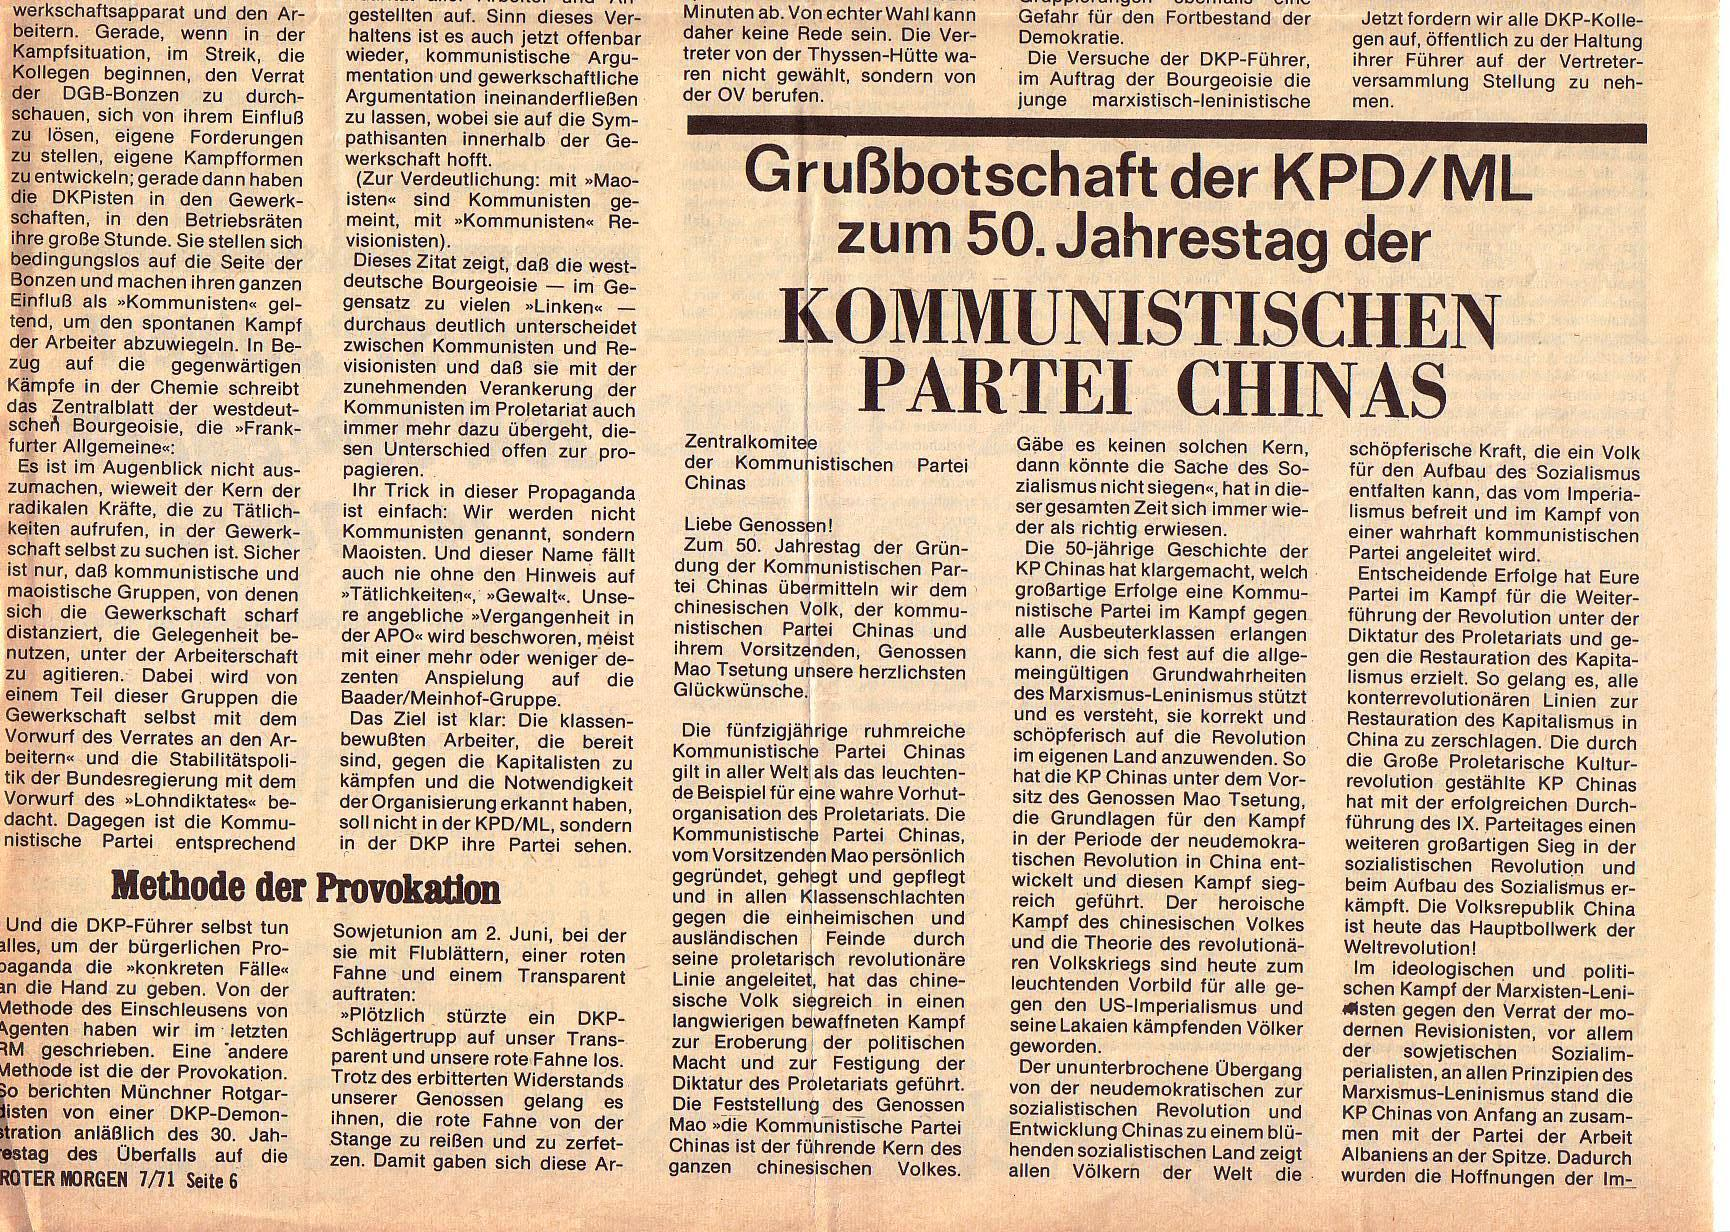 Roter Morgen, 5. Jg., Juli 1971, Nr. 7, Seite 6b